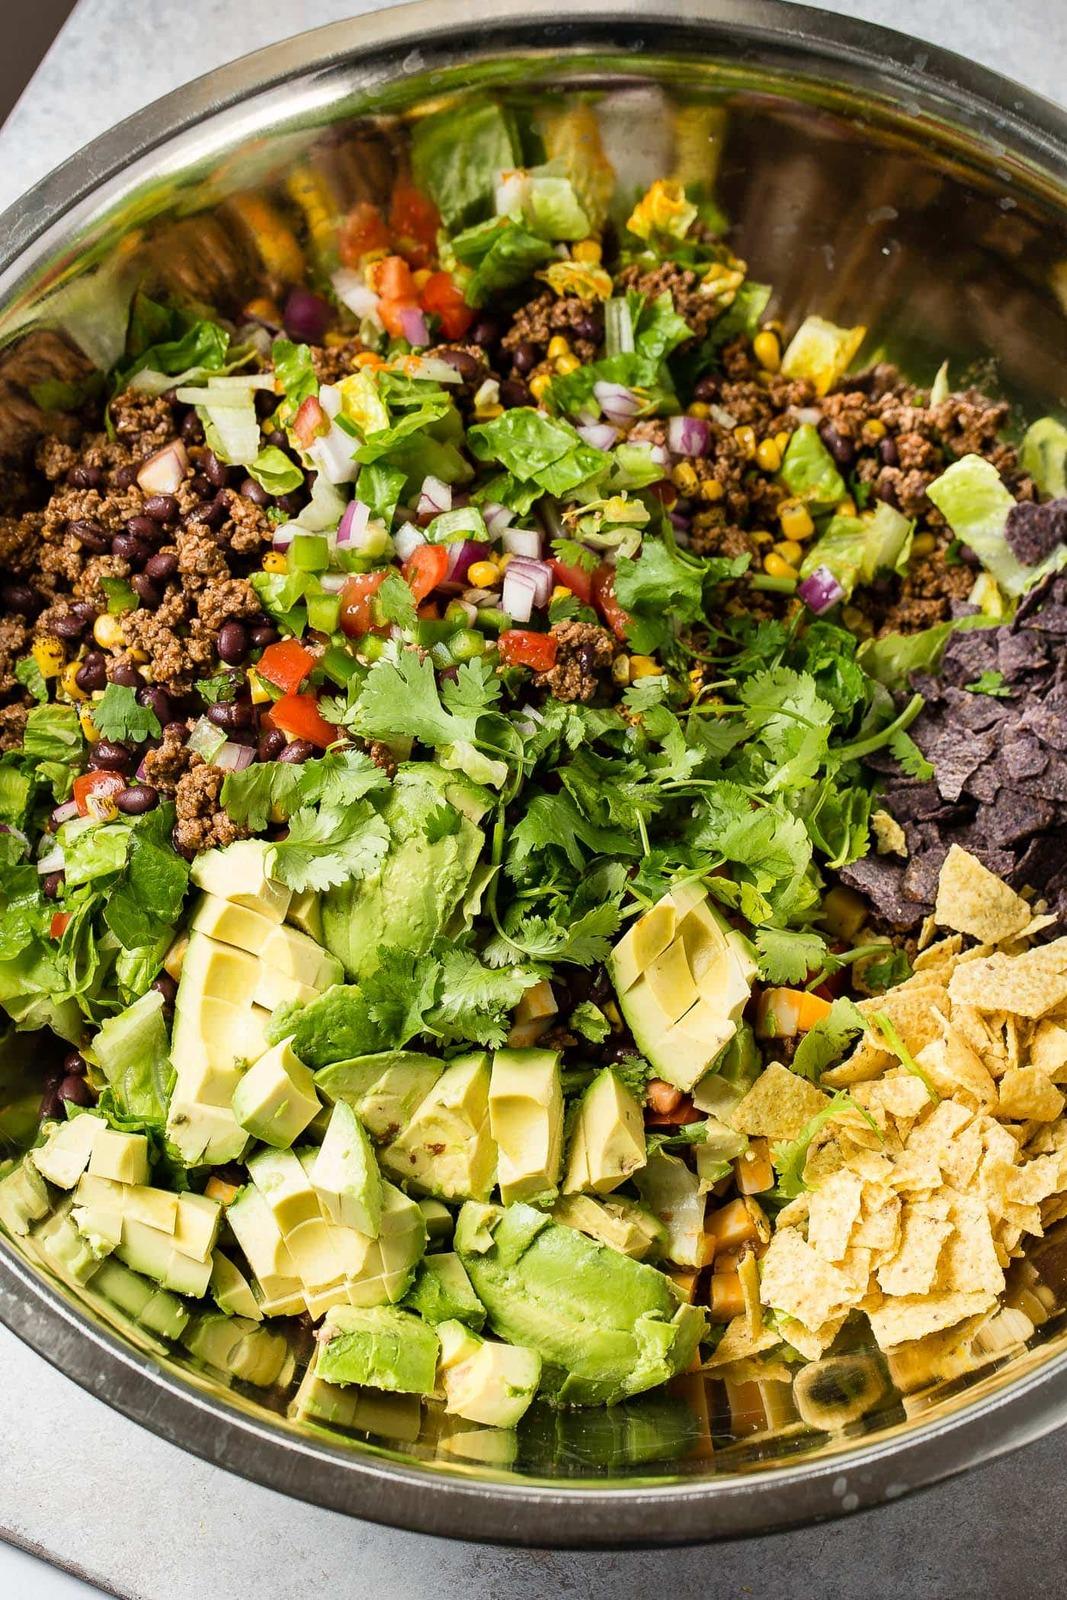 k-and-easy-tex-mex-ground-beef-taco-salad-recipe-4.jpg